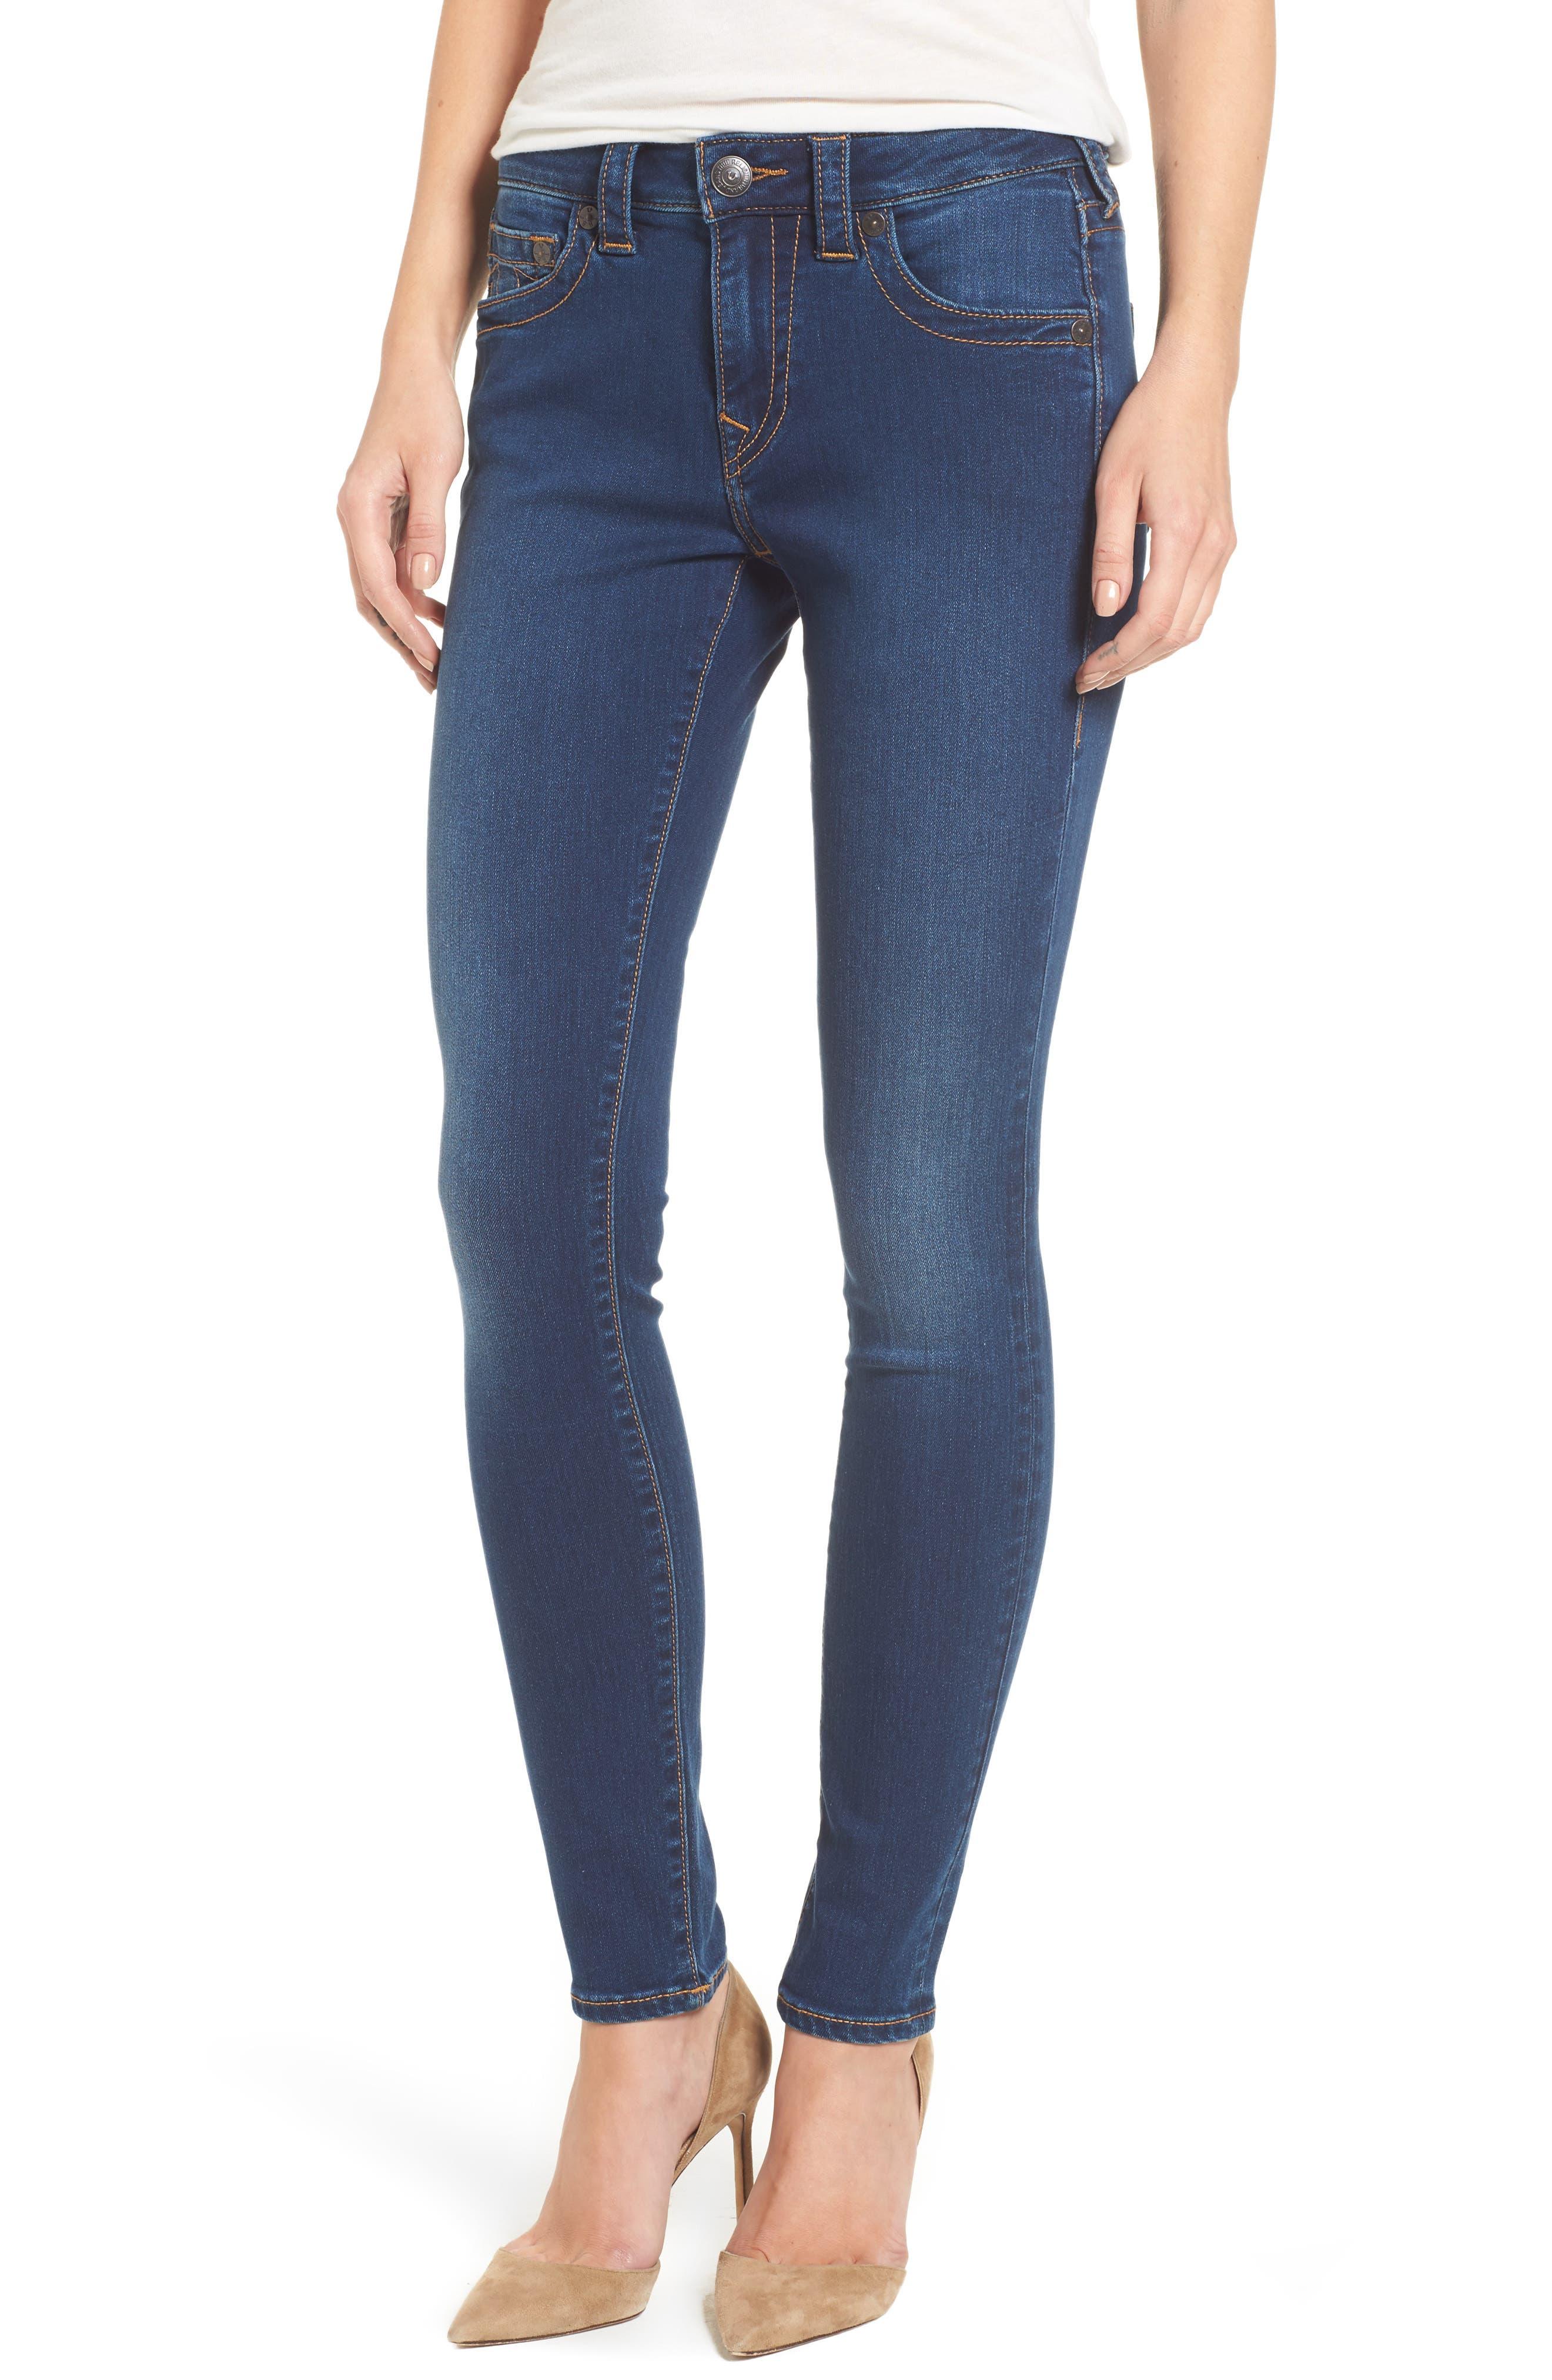 Main Image - True Religion Brand Jeans Jennie Curvy Skinny Jeans (Lands End Indigo)